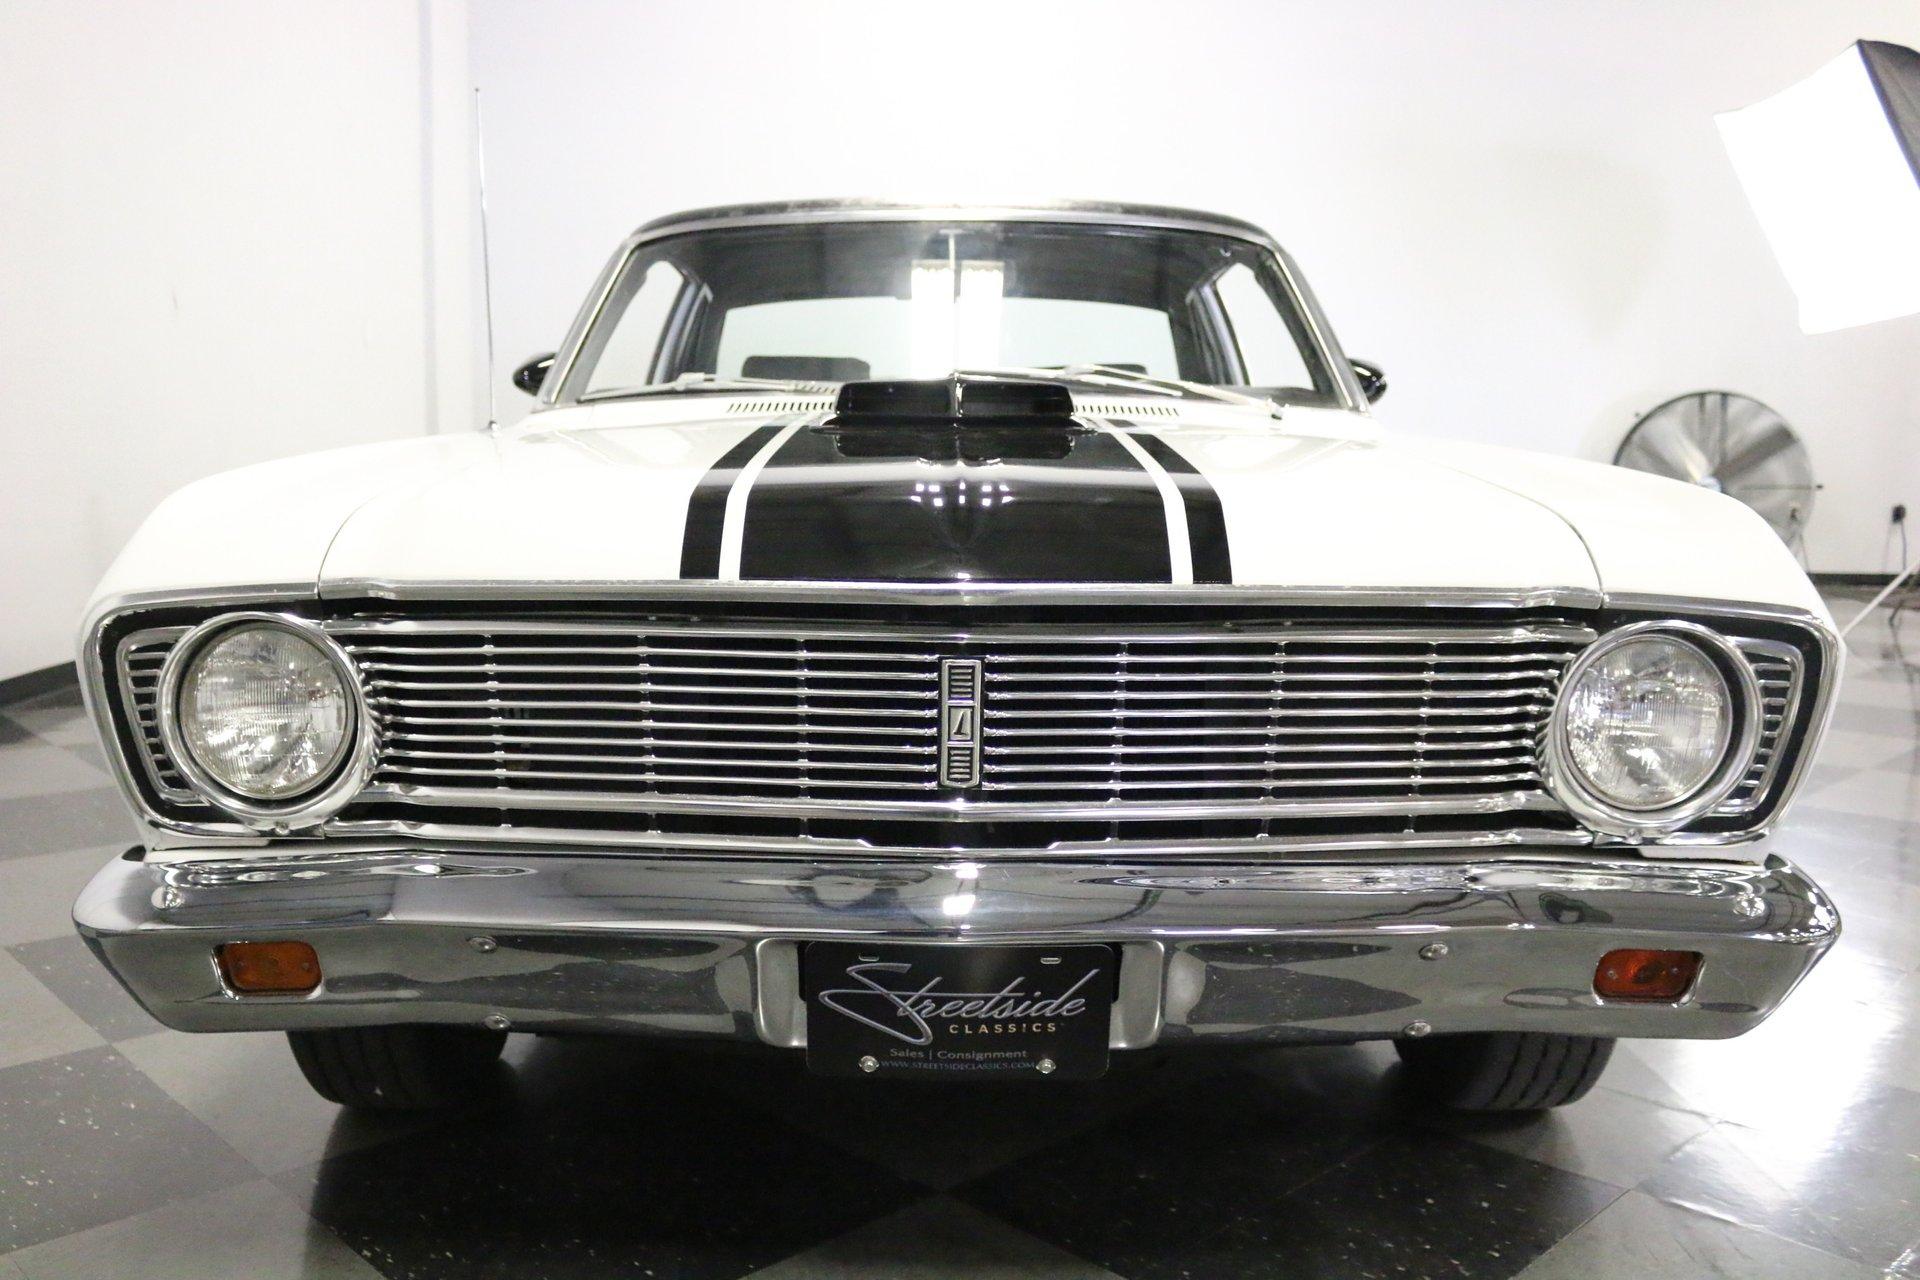 1966 Ford Falcon | Streetside Classics - The Nation's